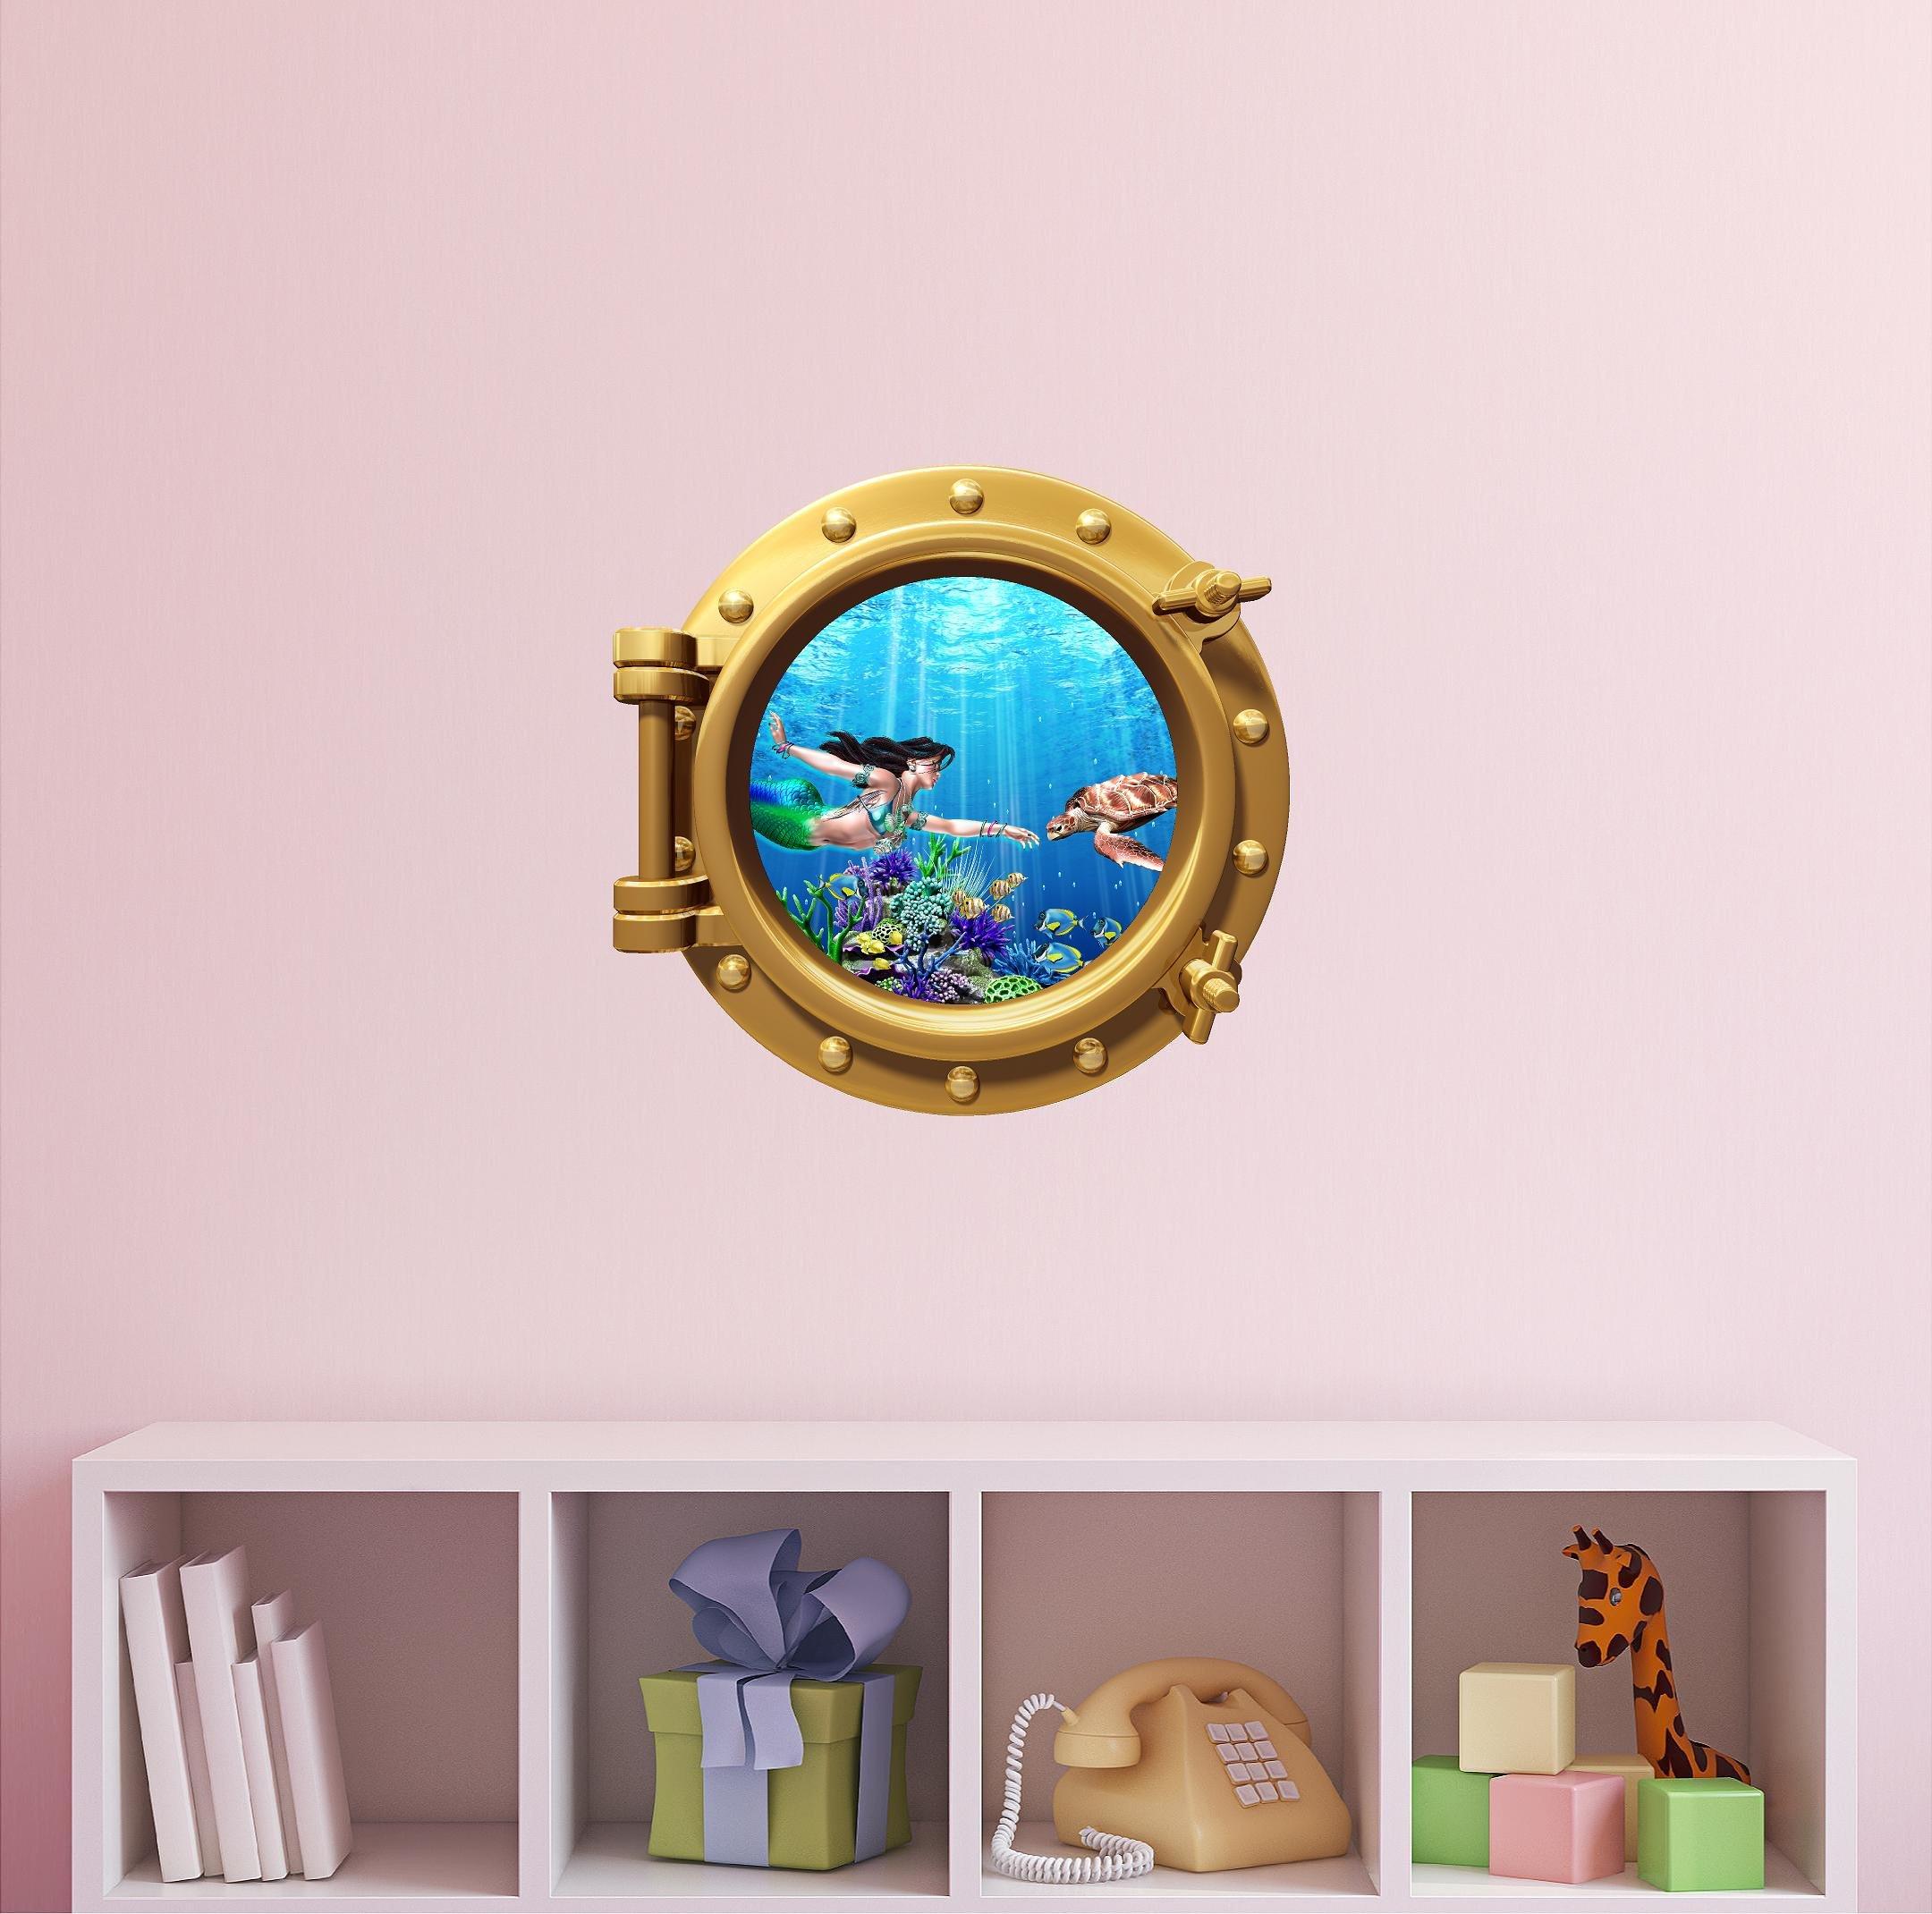 Mermaid Wall Decal - Ocean Wall Decals - Under The Sea Decal - Sea Turtle Wall Decal - Porthole Window Mermaid & Sea Turtle #1 BRONZE 12''